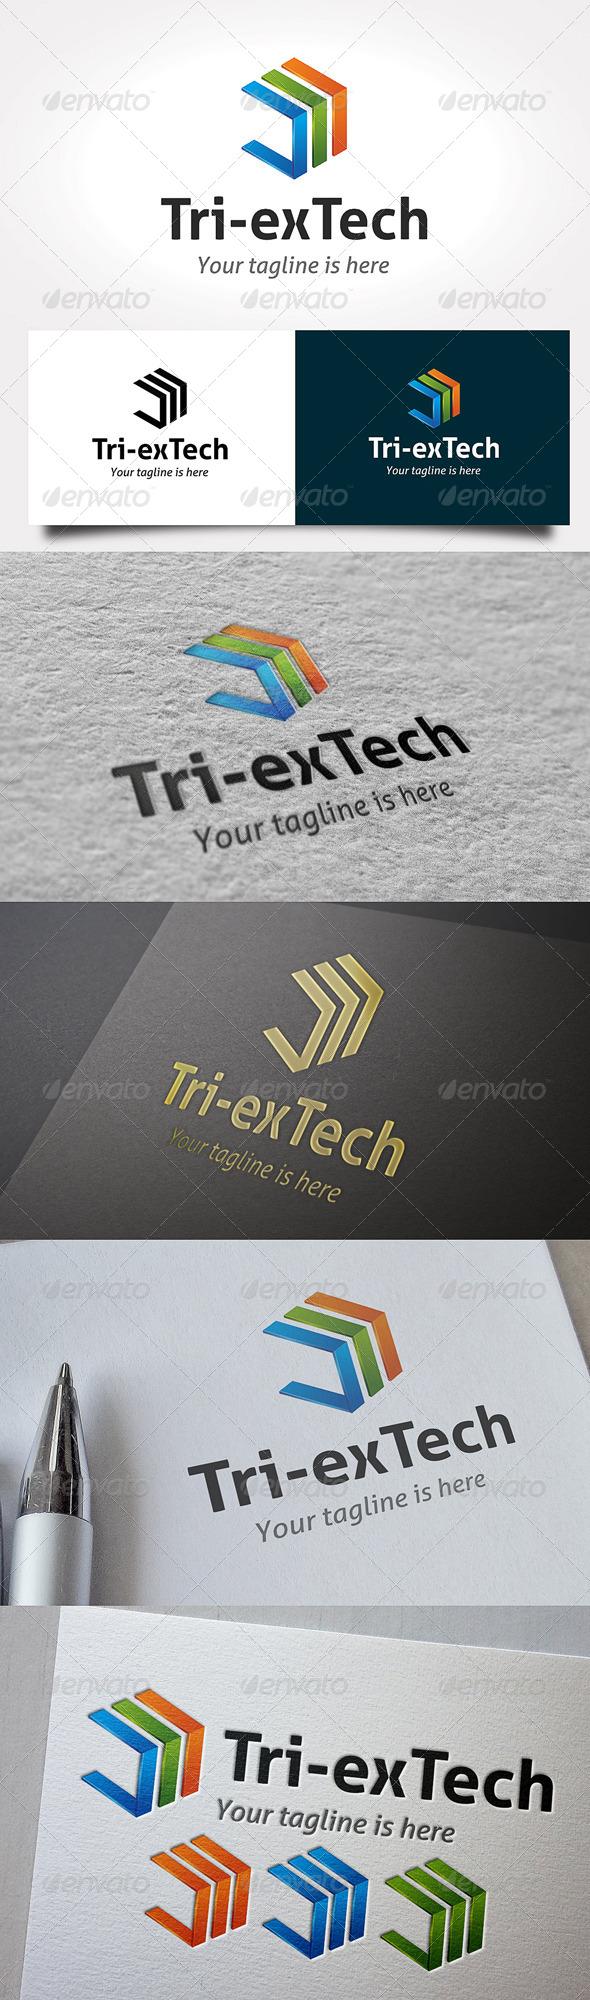 Tri-exTech Logo - 3d Abstract